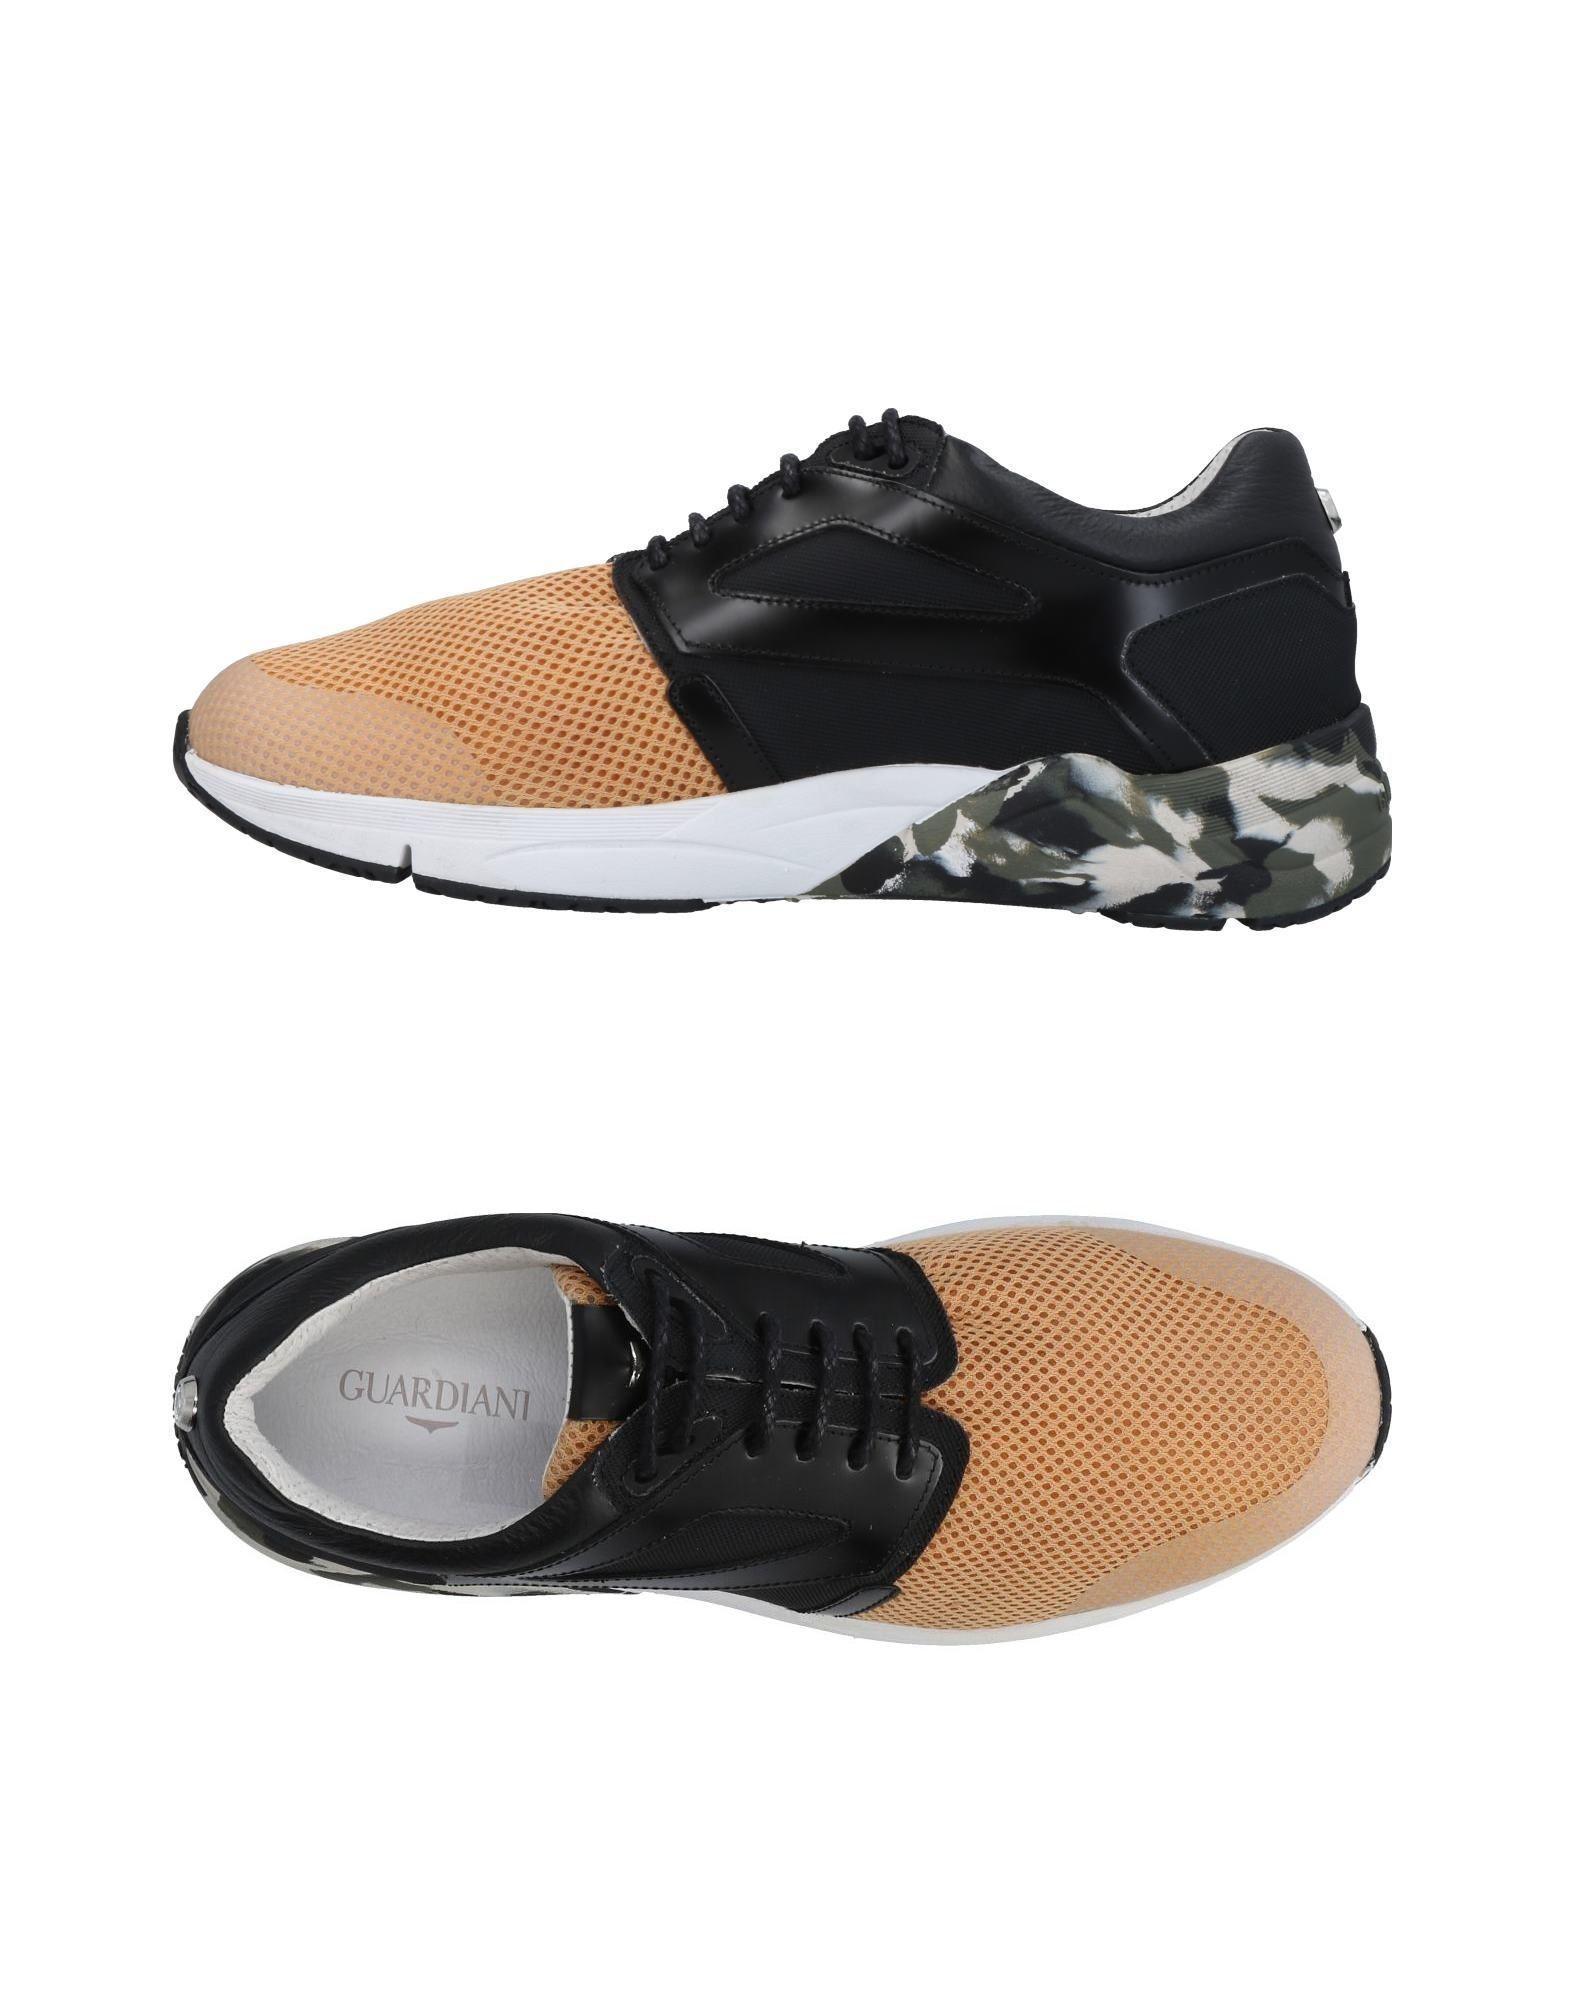 FOOTWEAR - Low-tops & sneakers Alberto Guardiani 6xtntu6